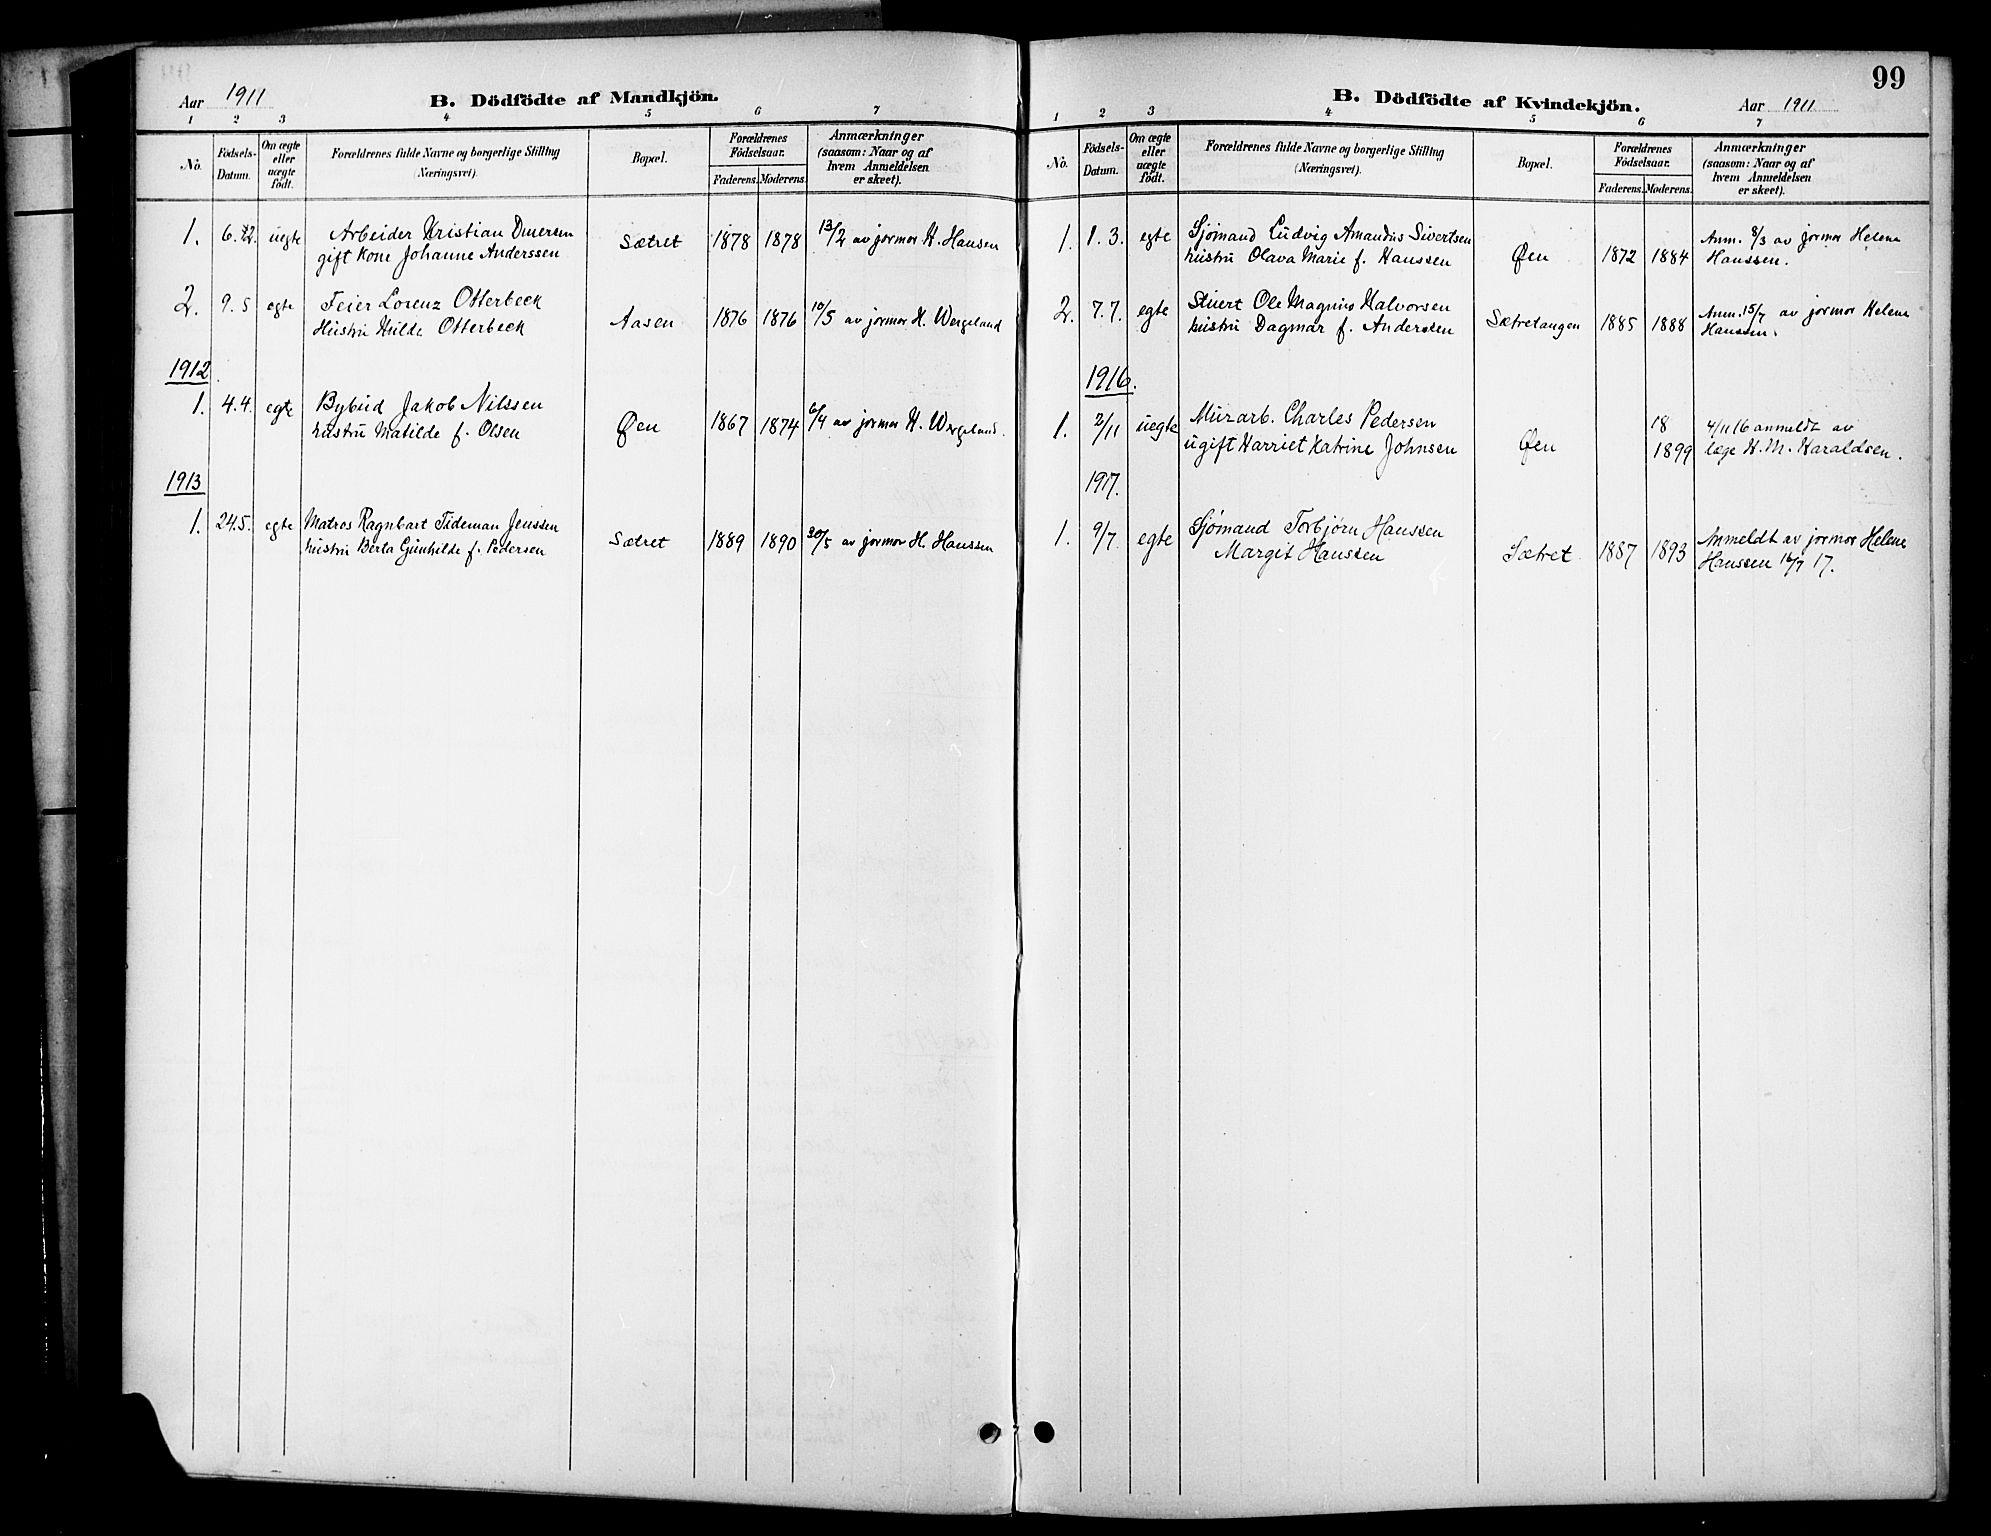 SAKO, Brevik kirkebøker, G/Ga/L0005: Klokkerbok nr. 5, 1901-1924, s. 99